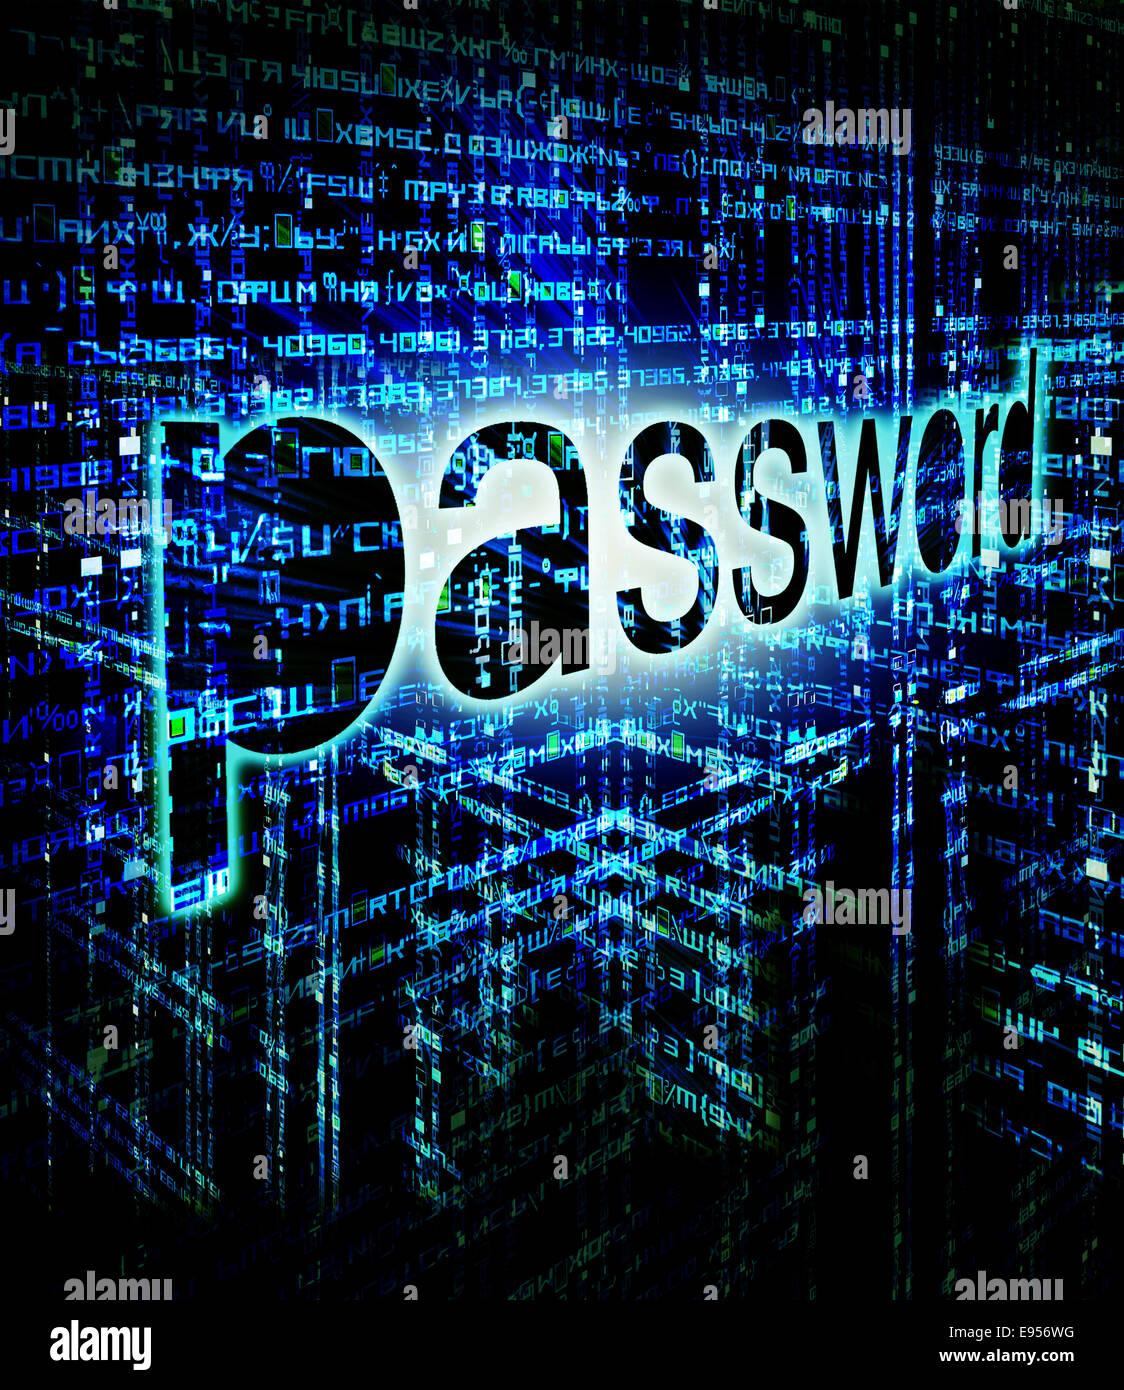 high quality password background digital illustration - Stock Image